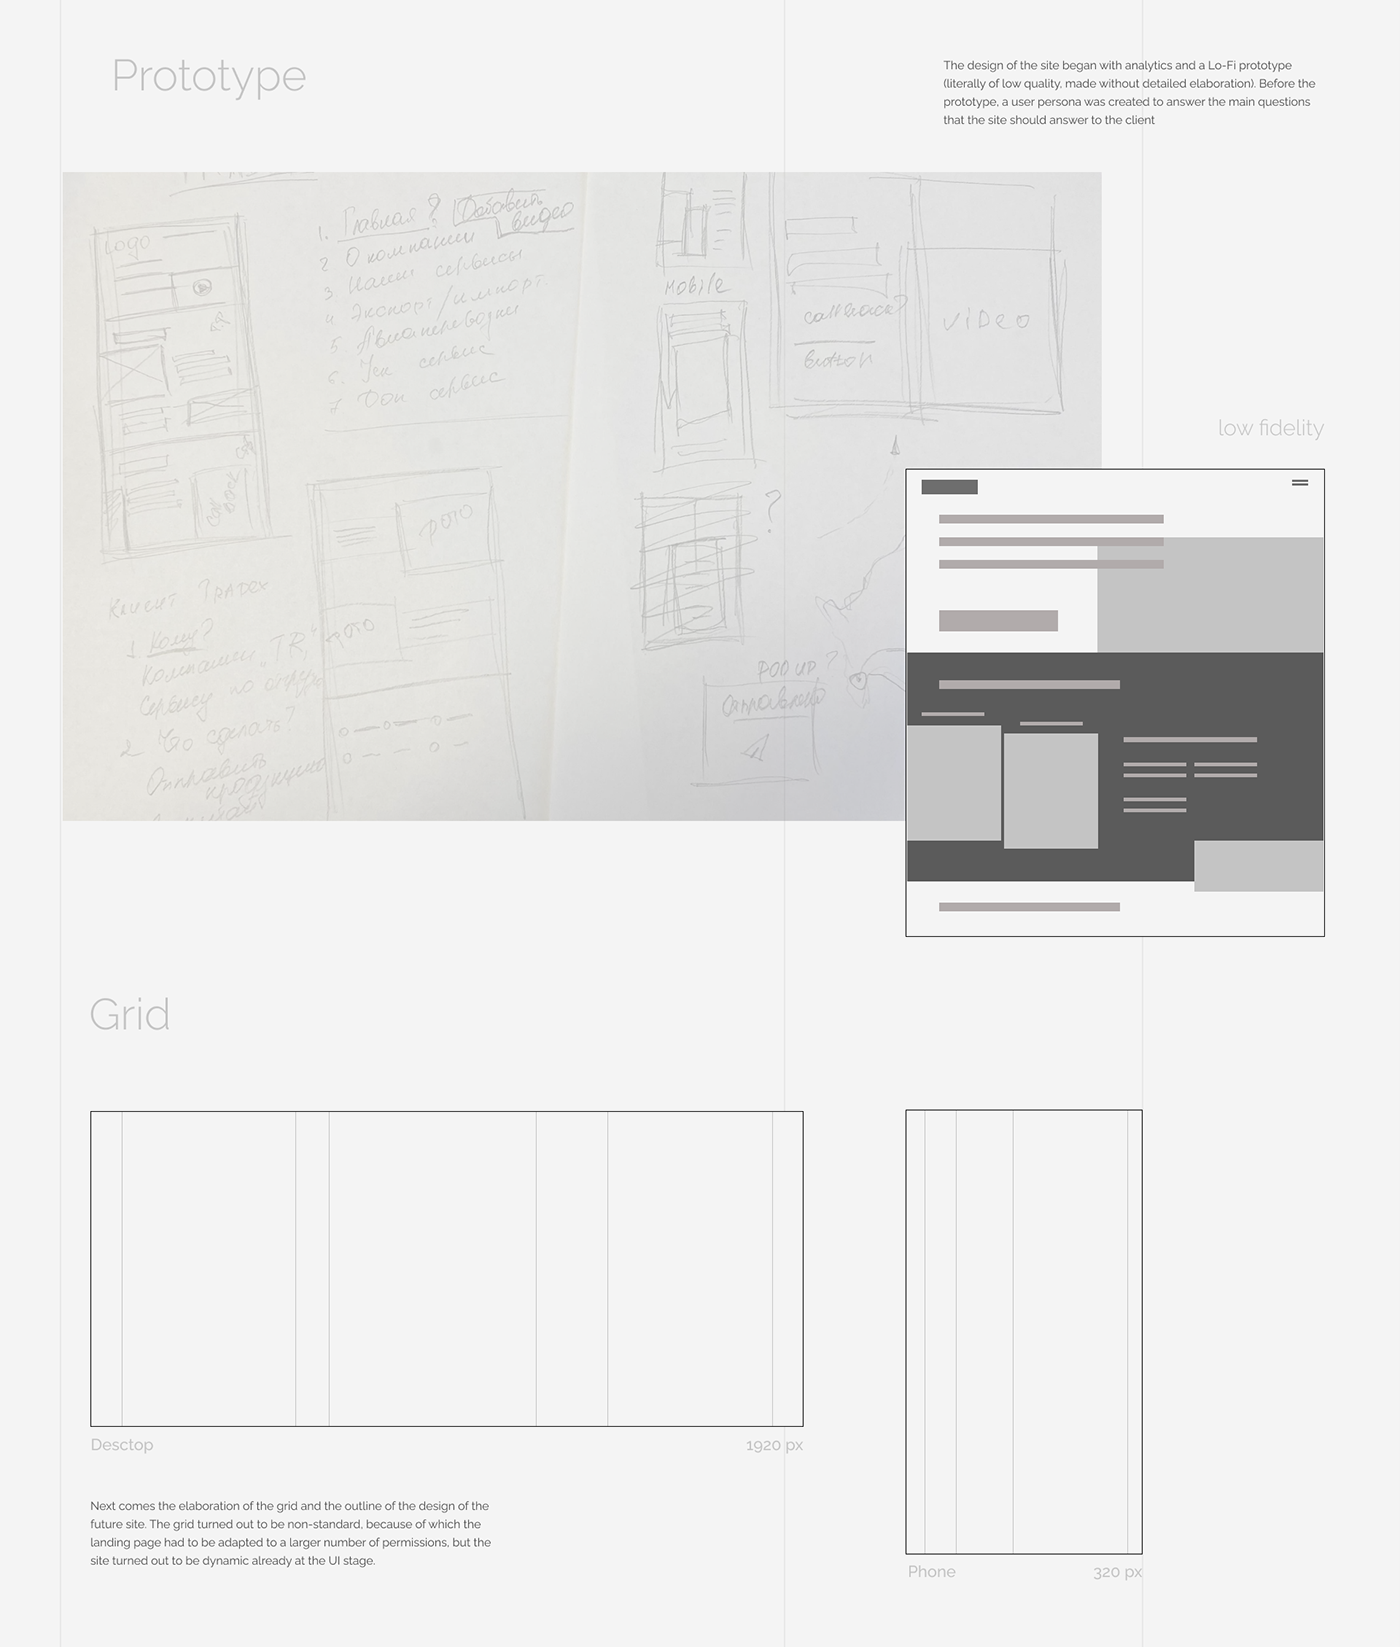 landing logistic UI uidesign uikit ux uxdesign Web